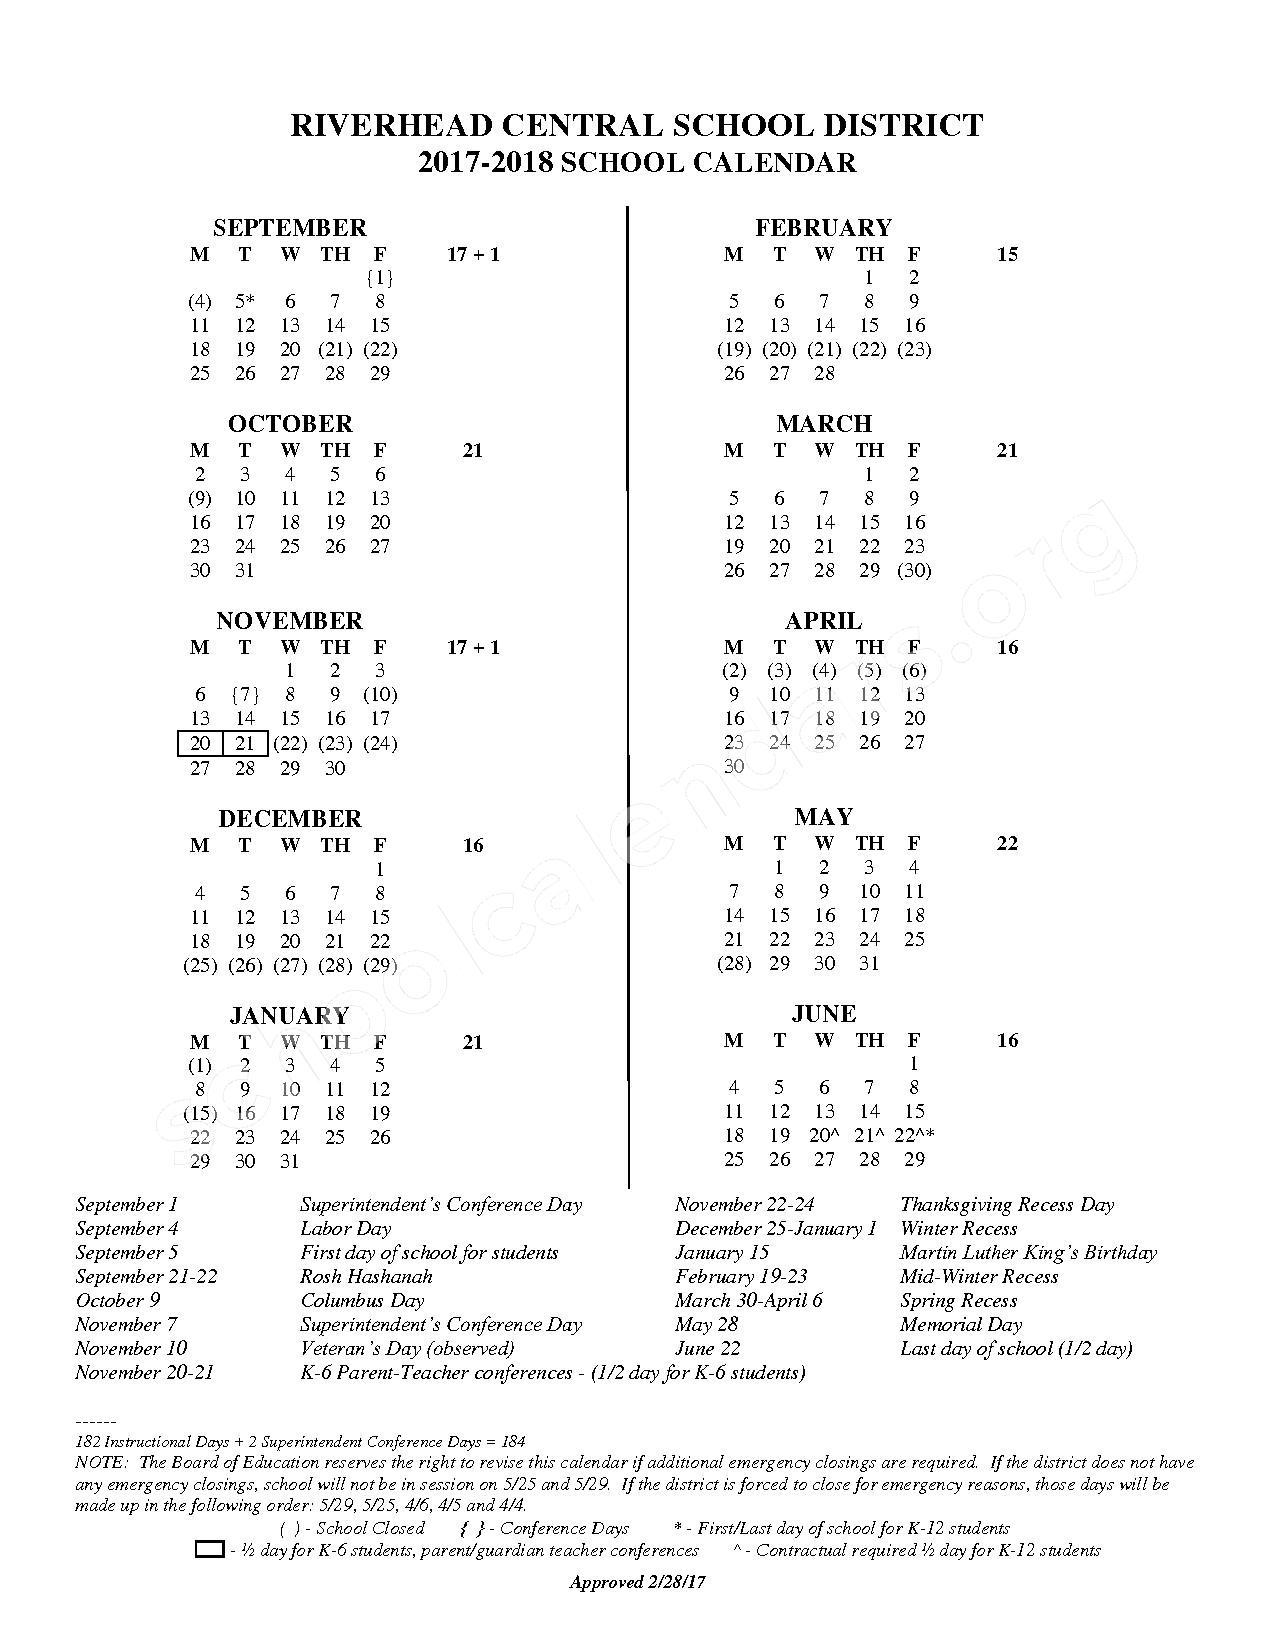 2017 - 2018 District Calendar – Riverhead Central School District – page 1